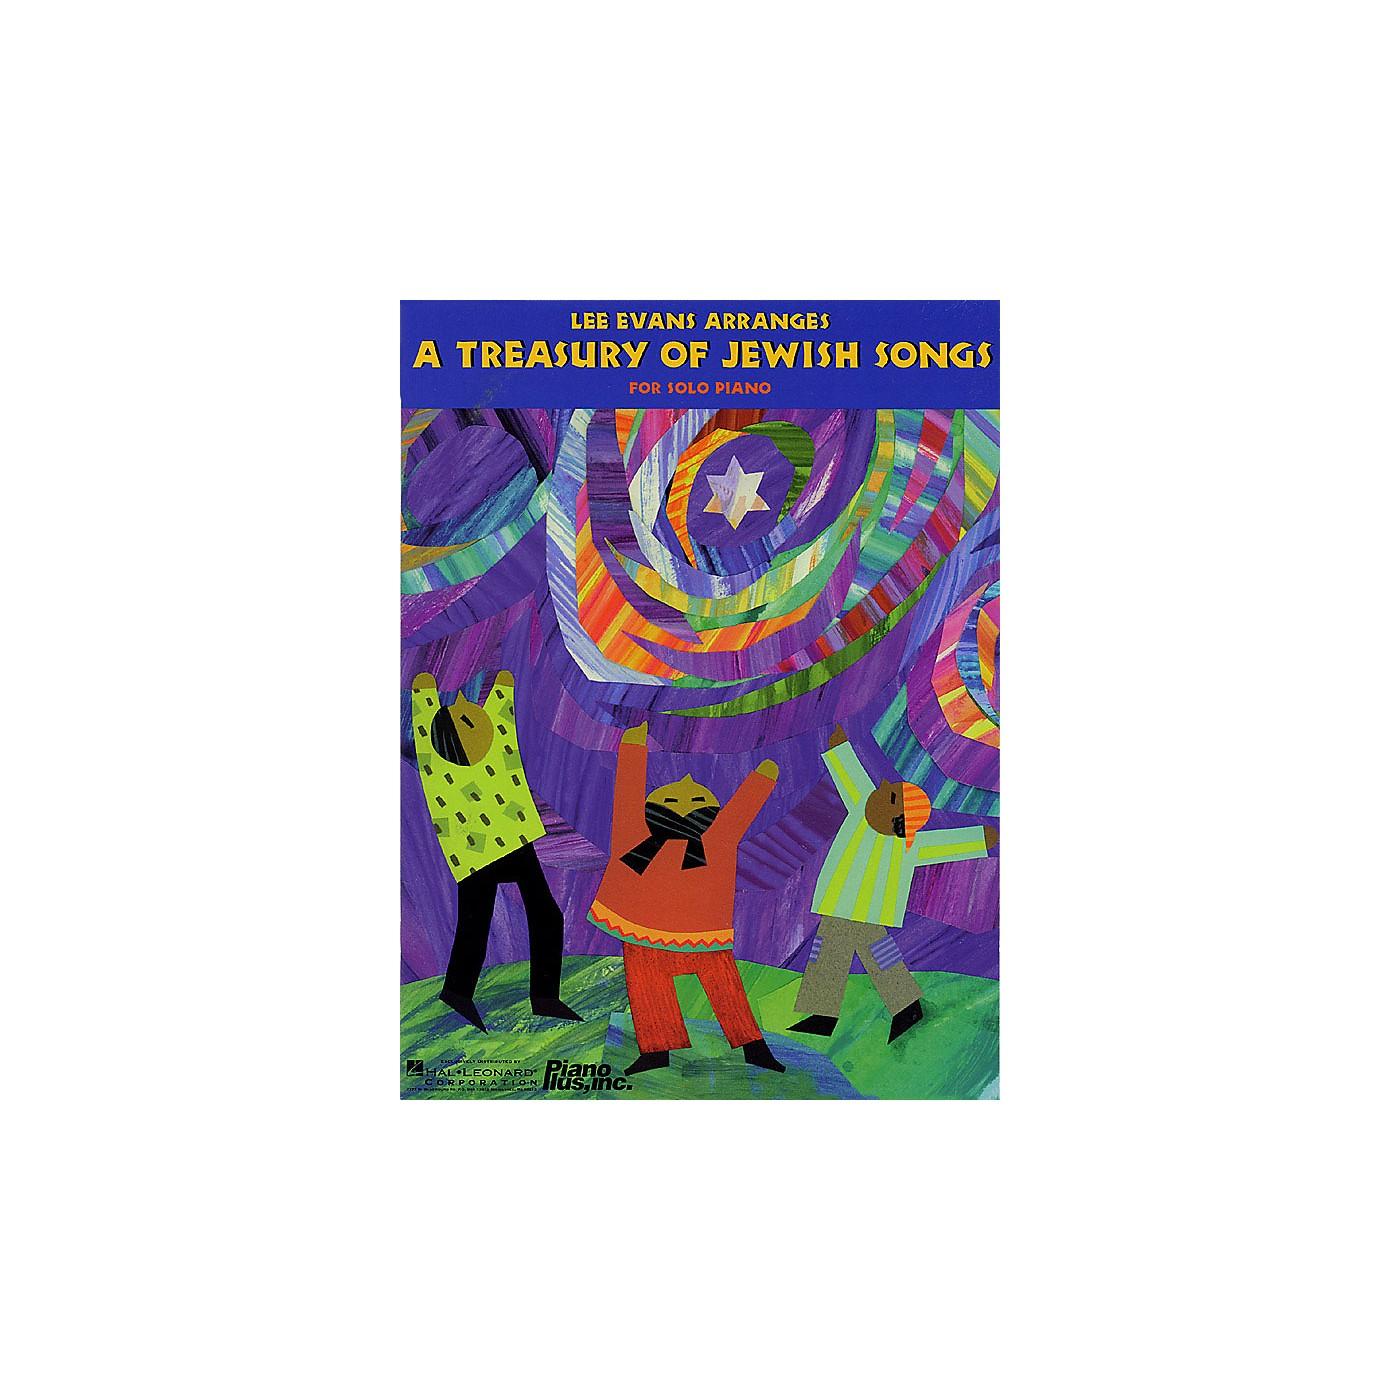 Hal Leonard A Treasury of Jewish Songs (Lee Evans Arranges) Evans Piano Education Series (Intermediate) thumbnail